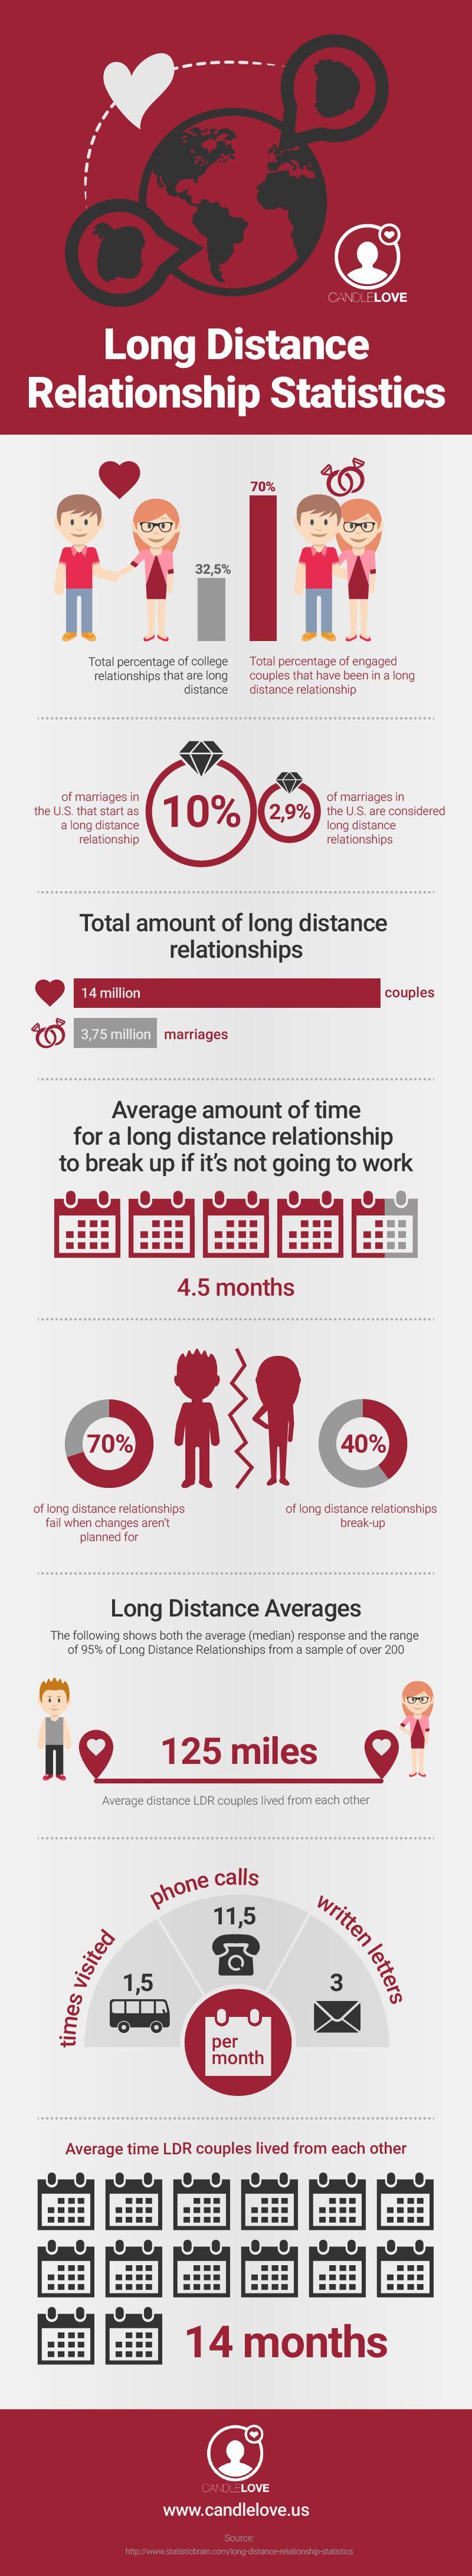 Long Distance Relationship Statistics #infographic #Love #Relationship